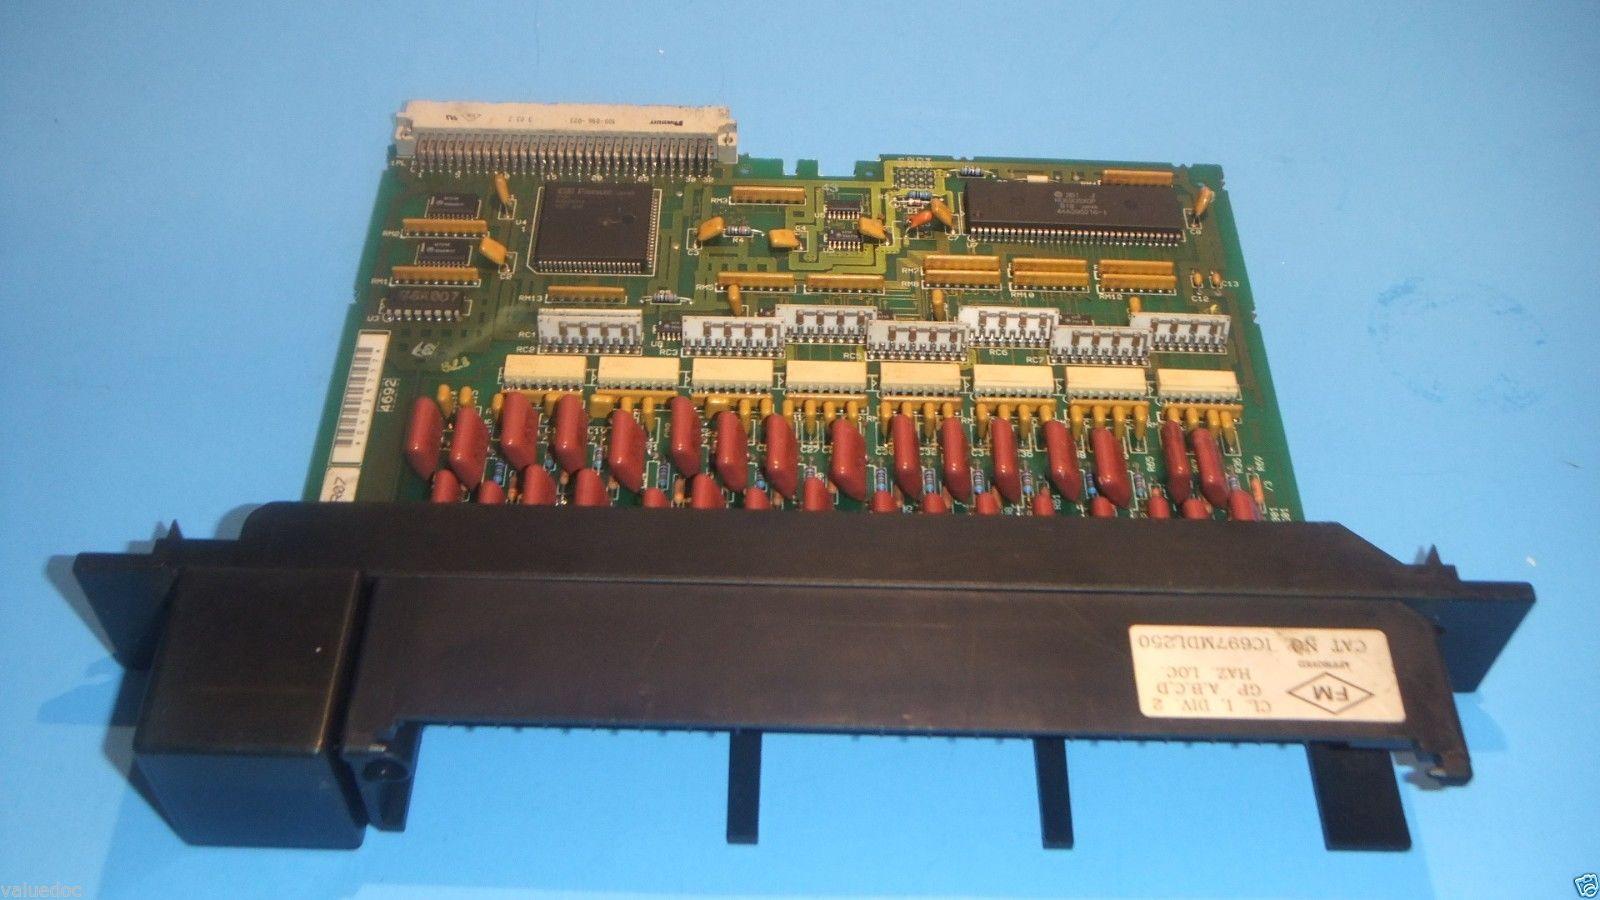 GE FANUC SERIES IC697MDL250 90-70 Series PLC input card